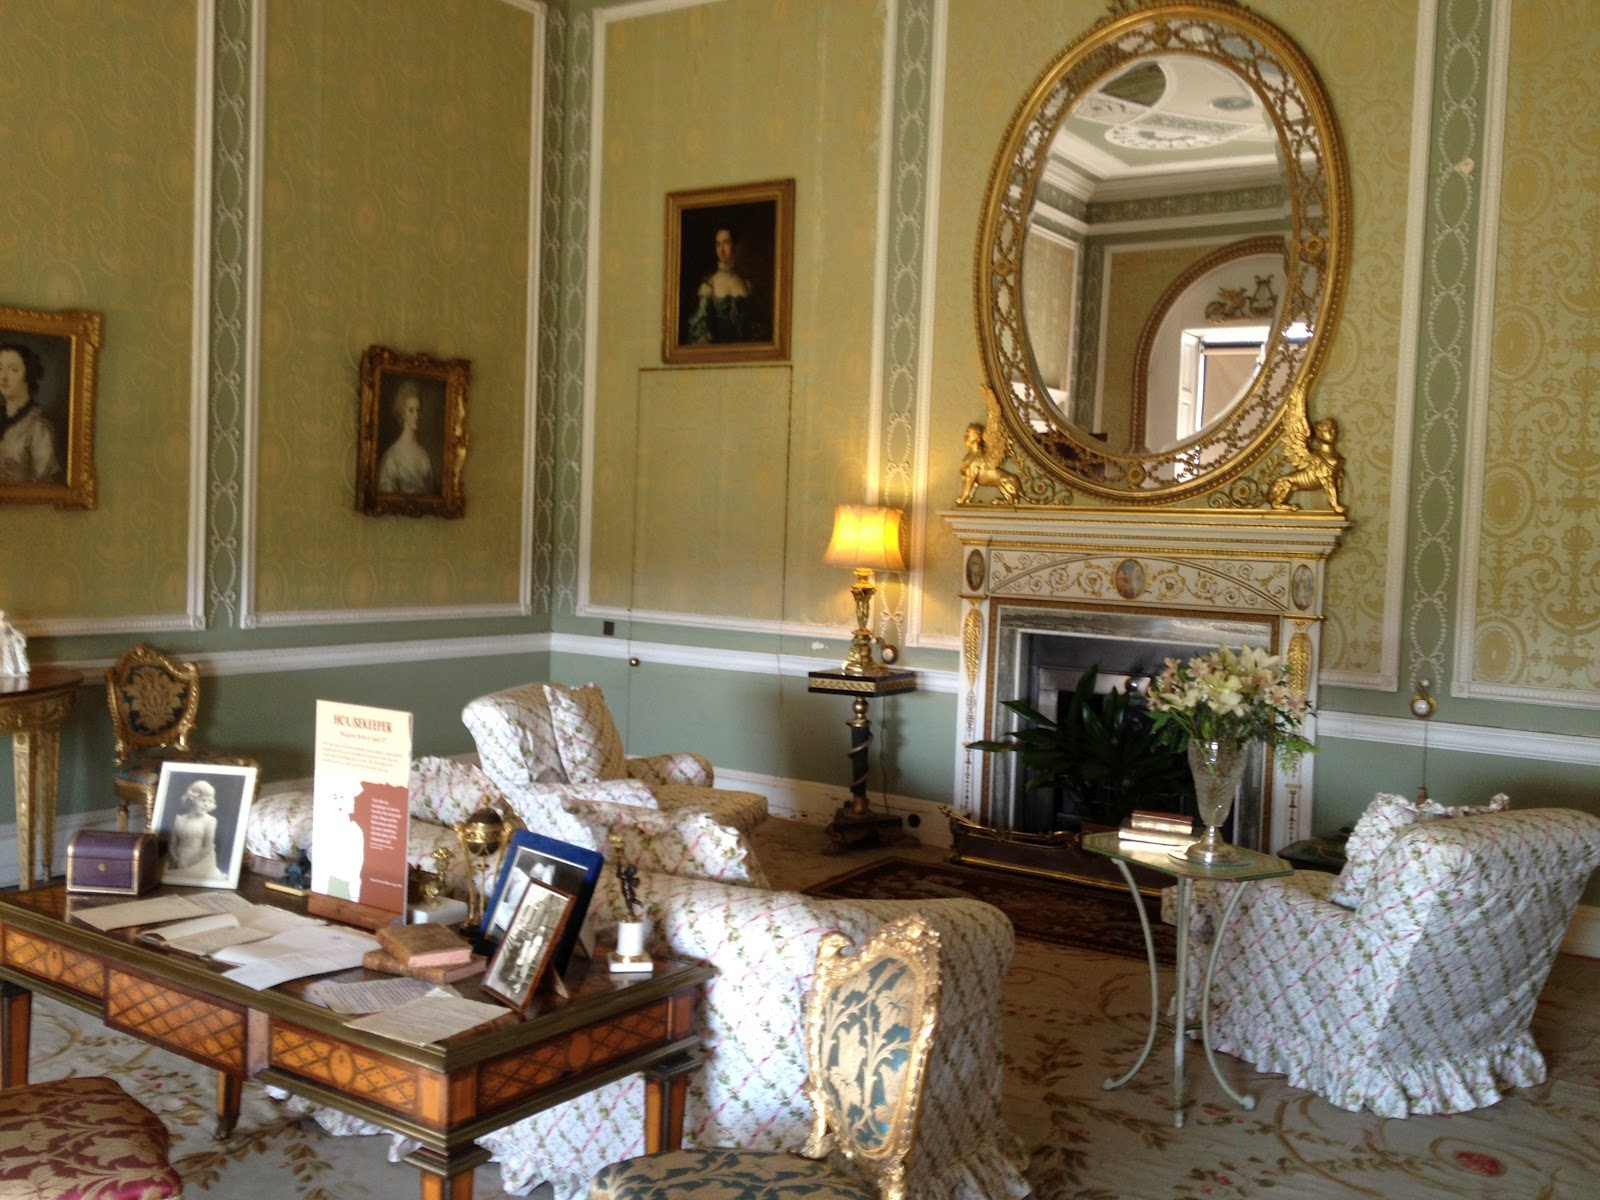 Regency Tea Party: Horncastle Regency Festival: Part 4